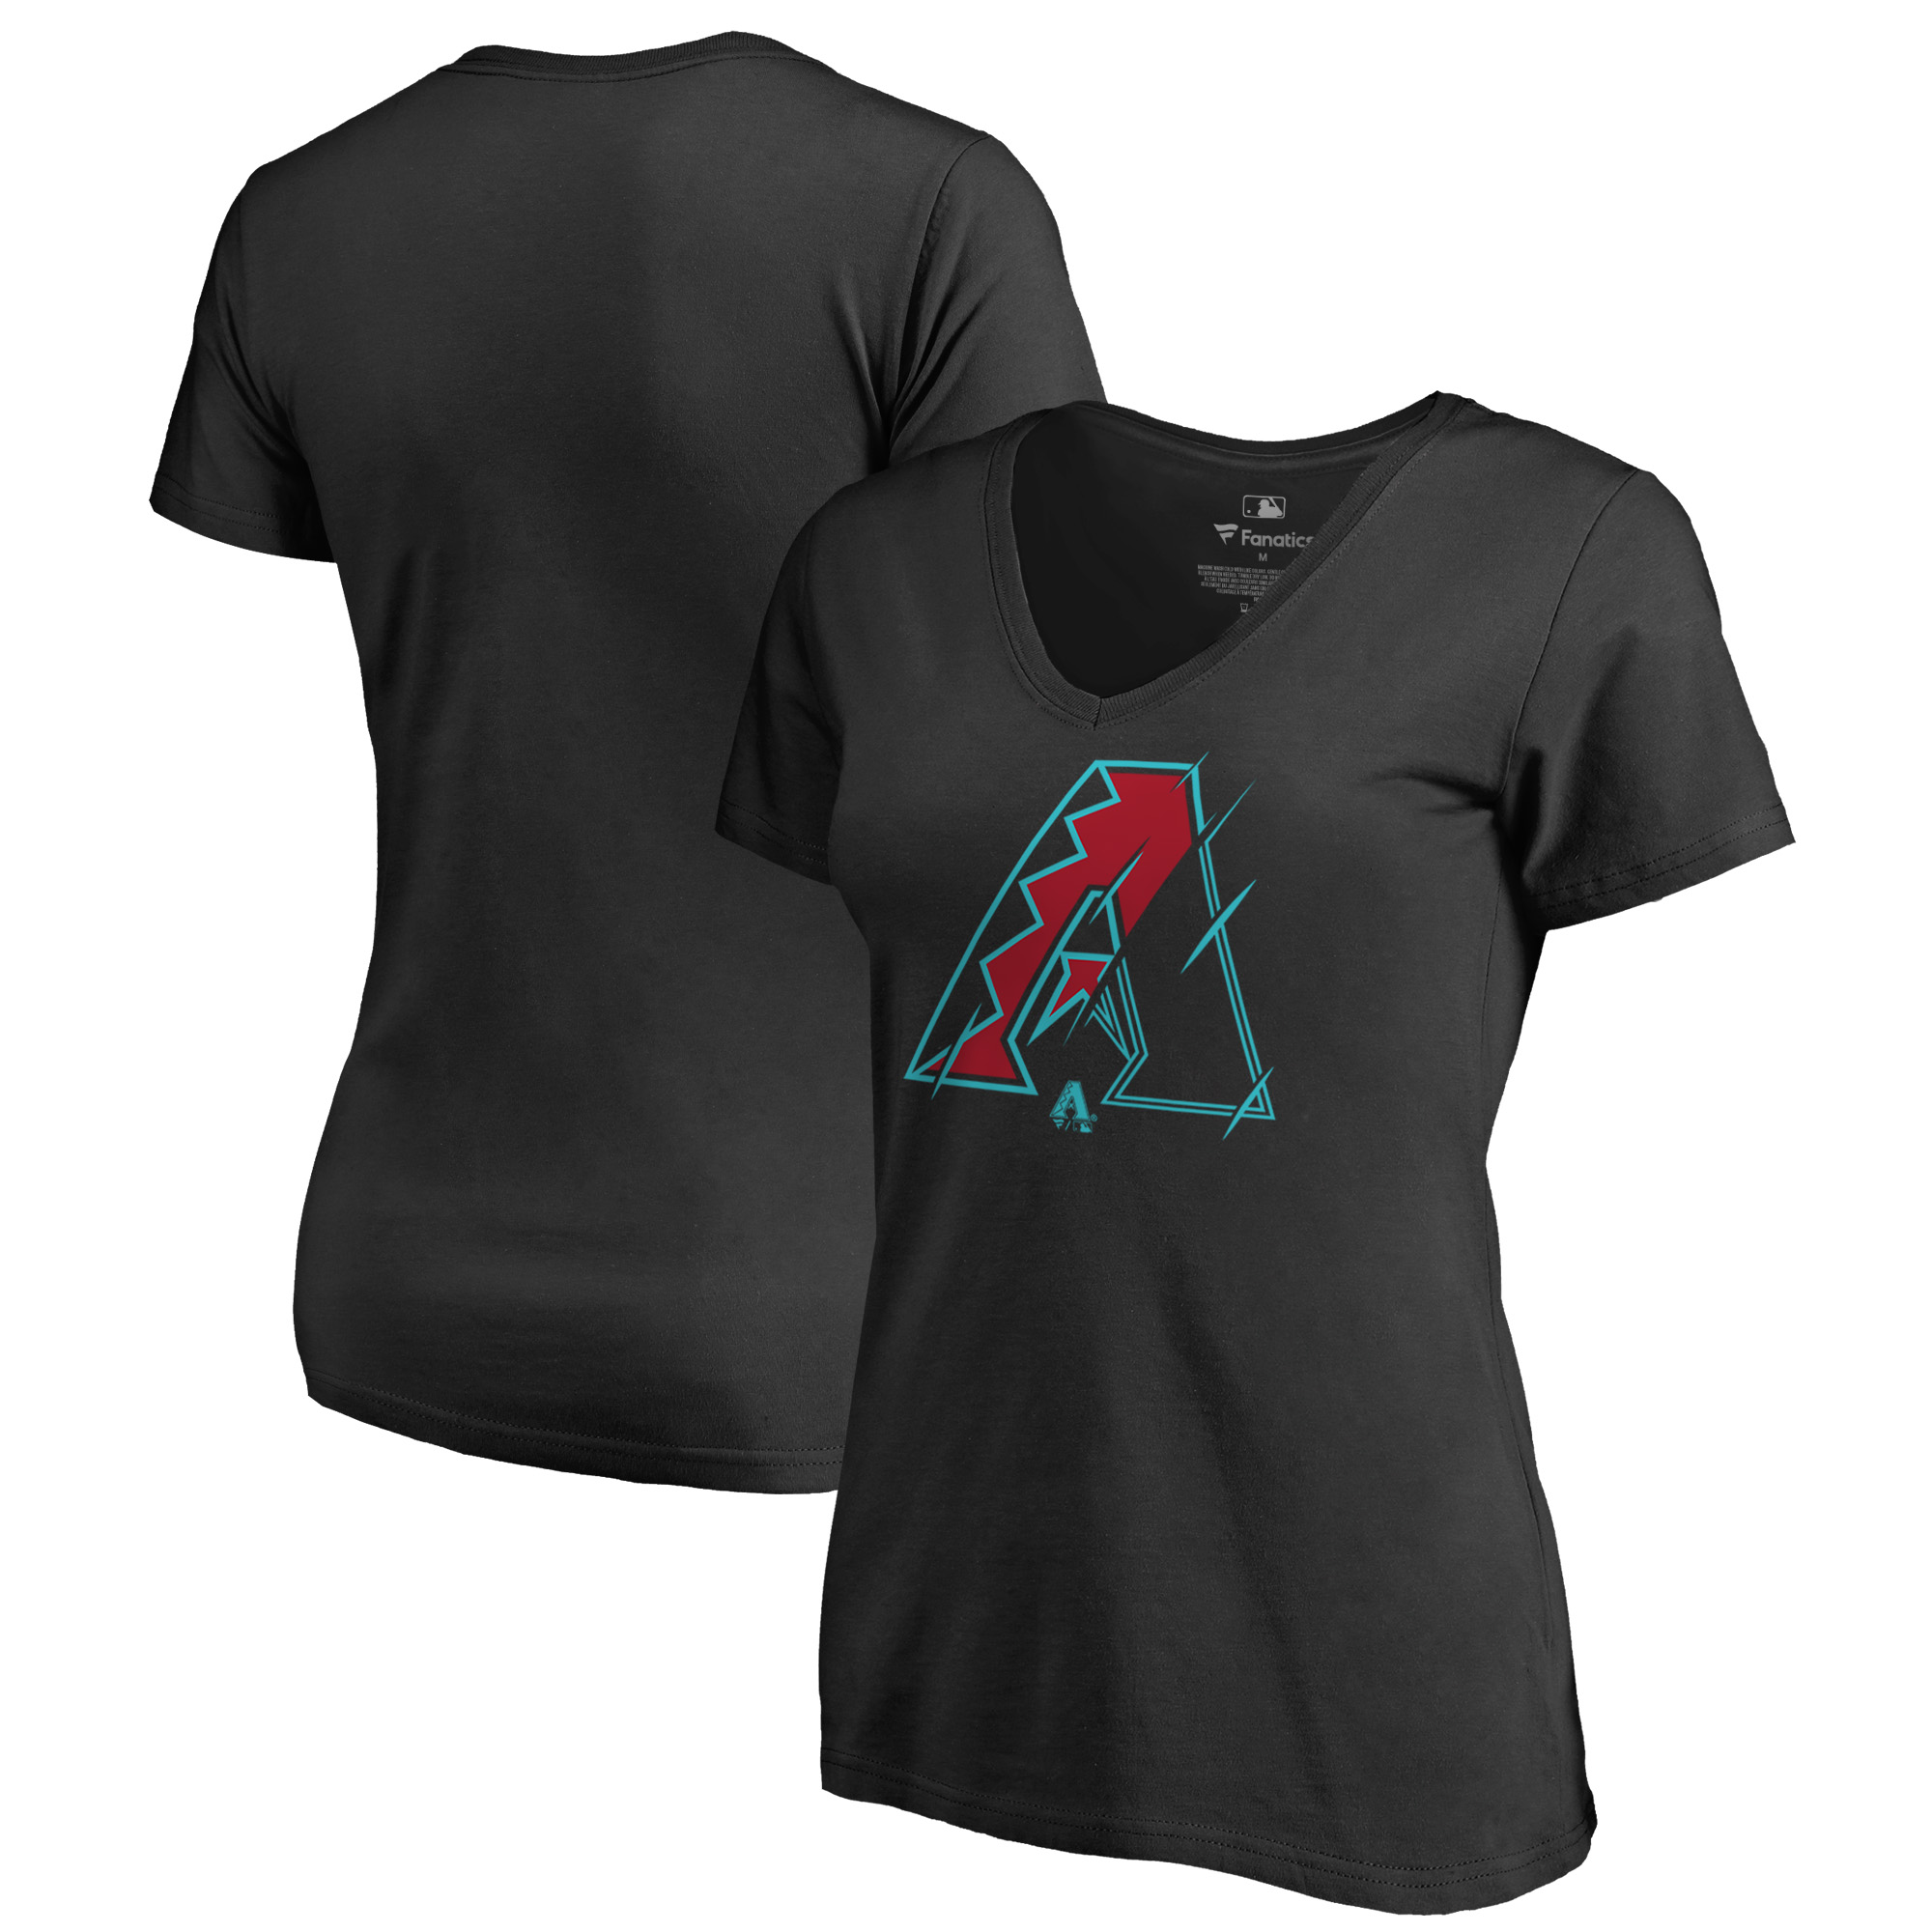 Arizona Diamondbacks Fanatics Branded Women's X-Ray V-Neck T-Shirt - Black